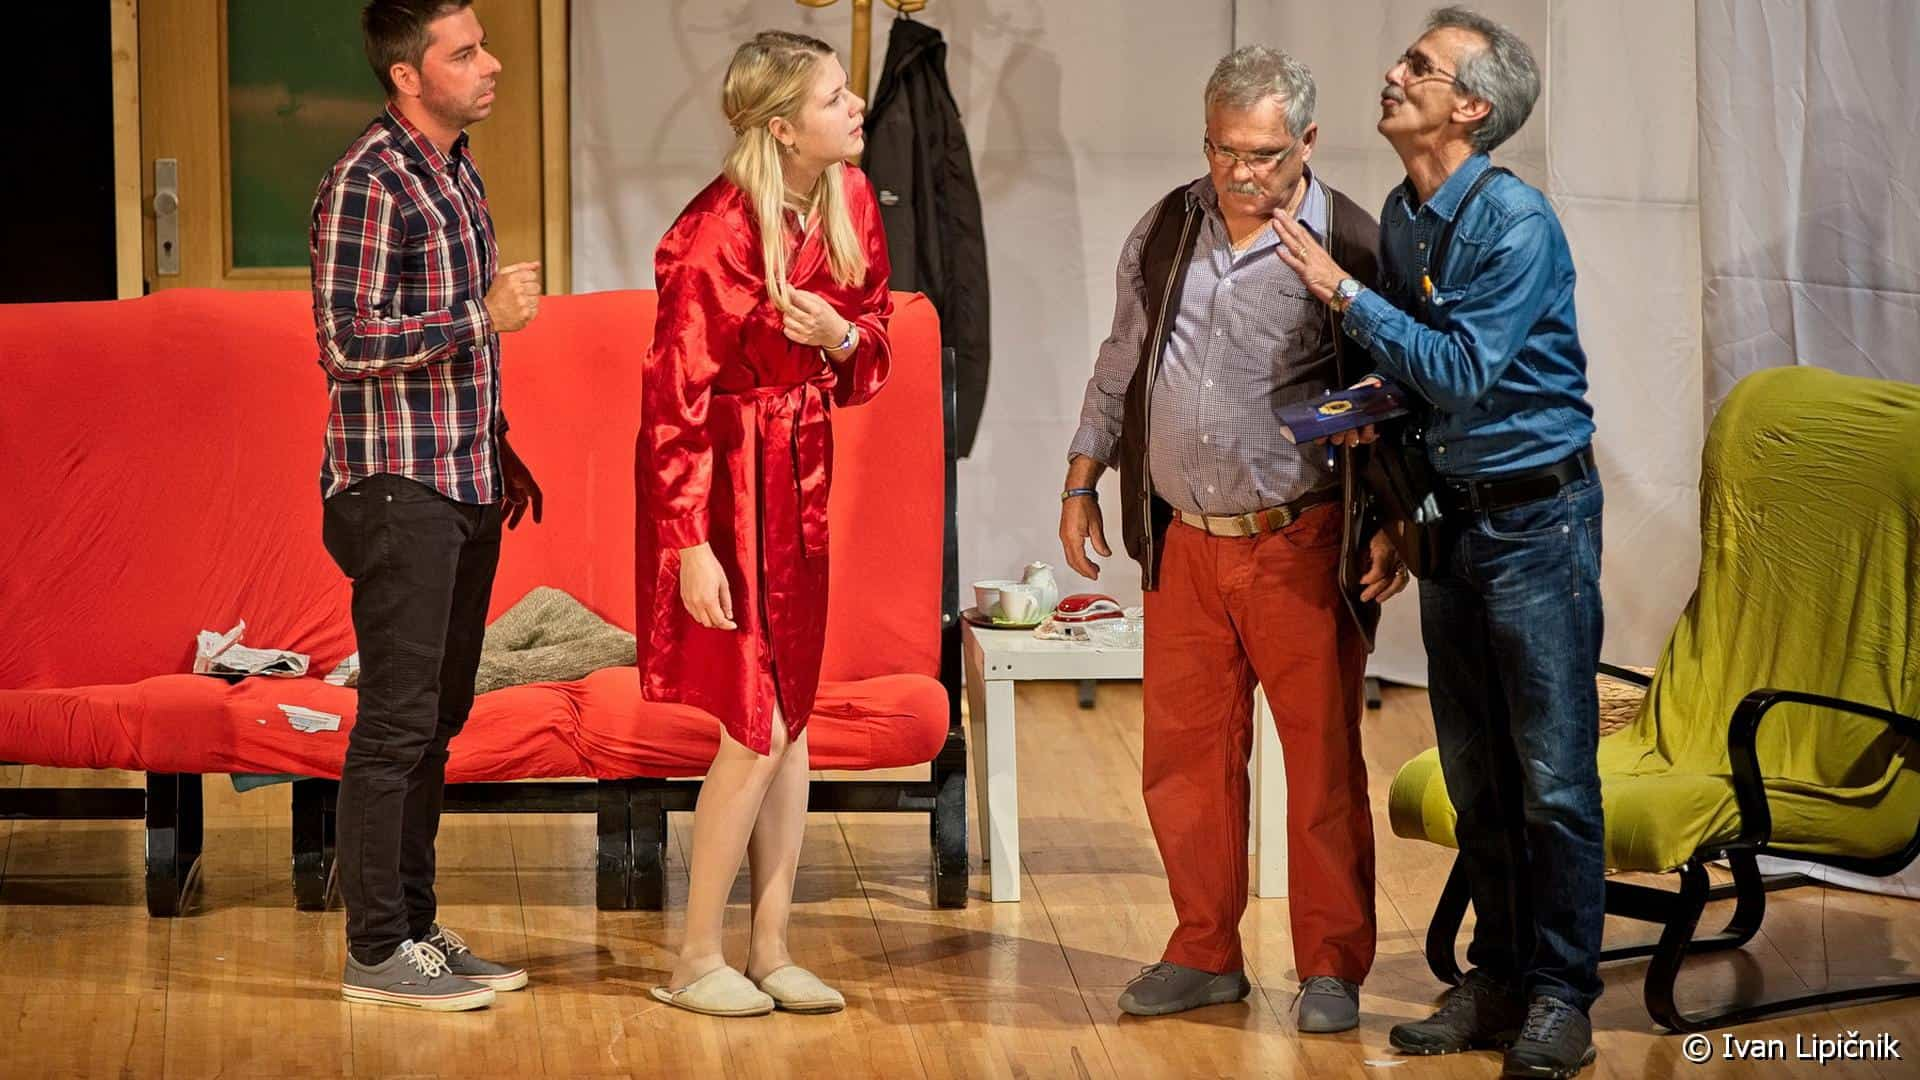 ZbeziOdZene 20 - GALERIJA DOGODKOV: Gledališka predstava - Zbeži od žene, 13. oktober 2019  ( FOTO: Ivan Lipičnik )